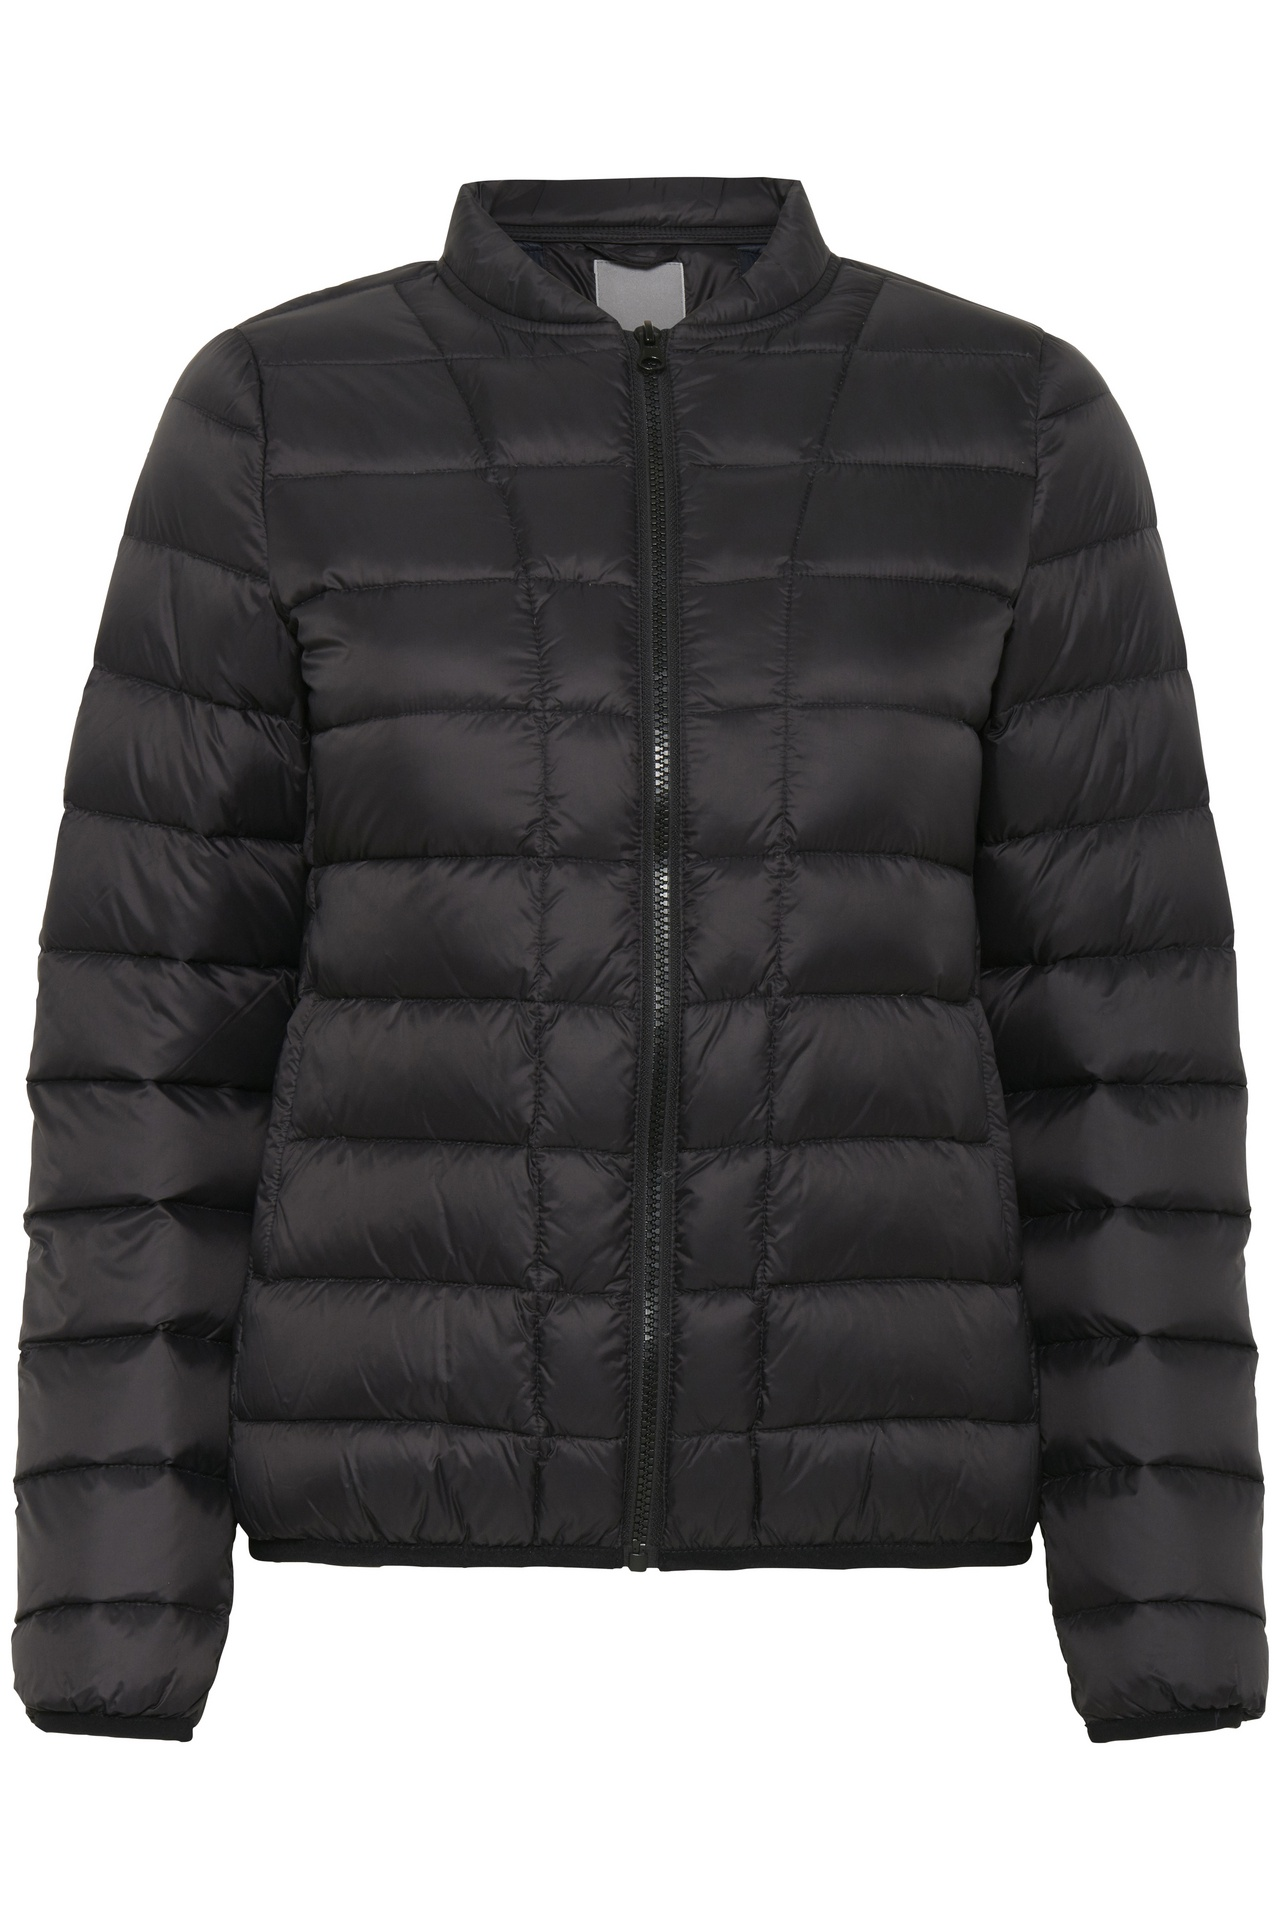 Fransa Madown Jacket